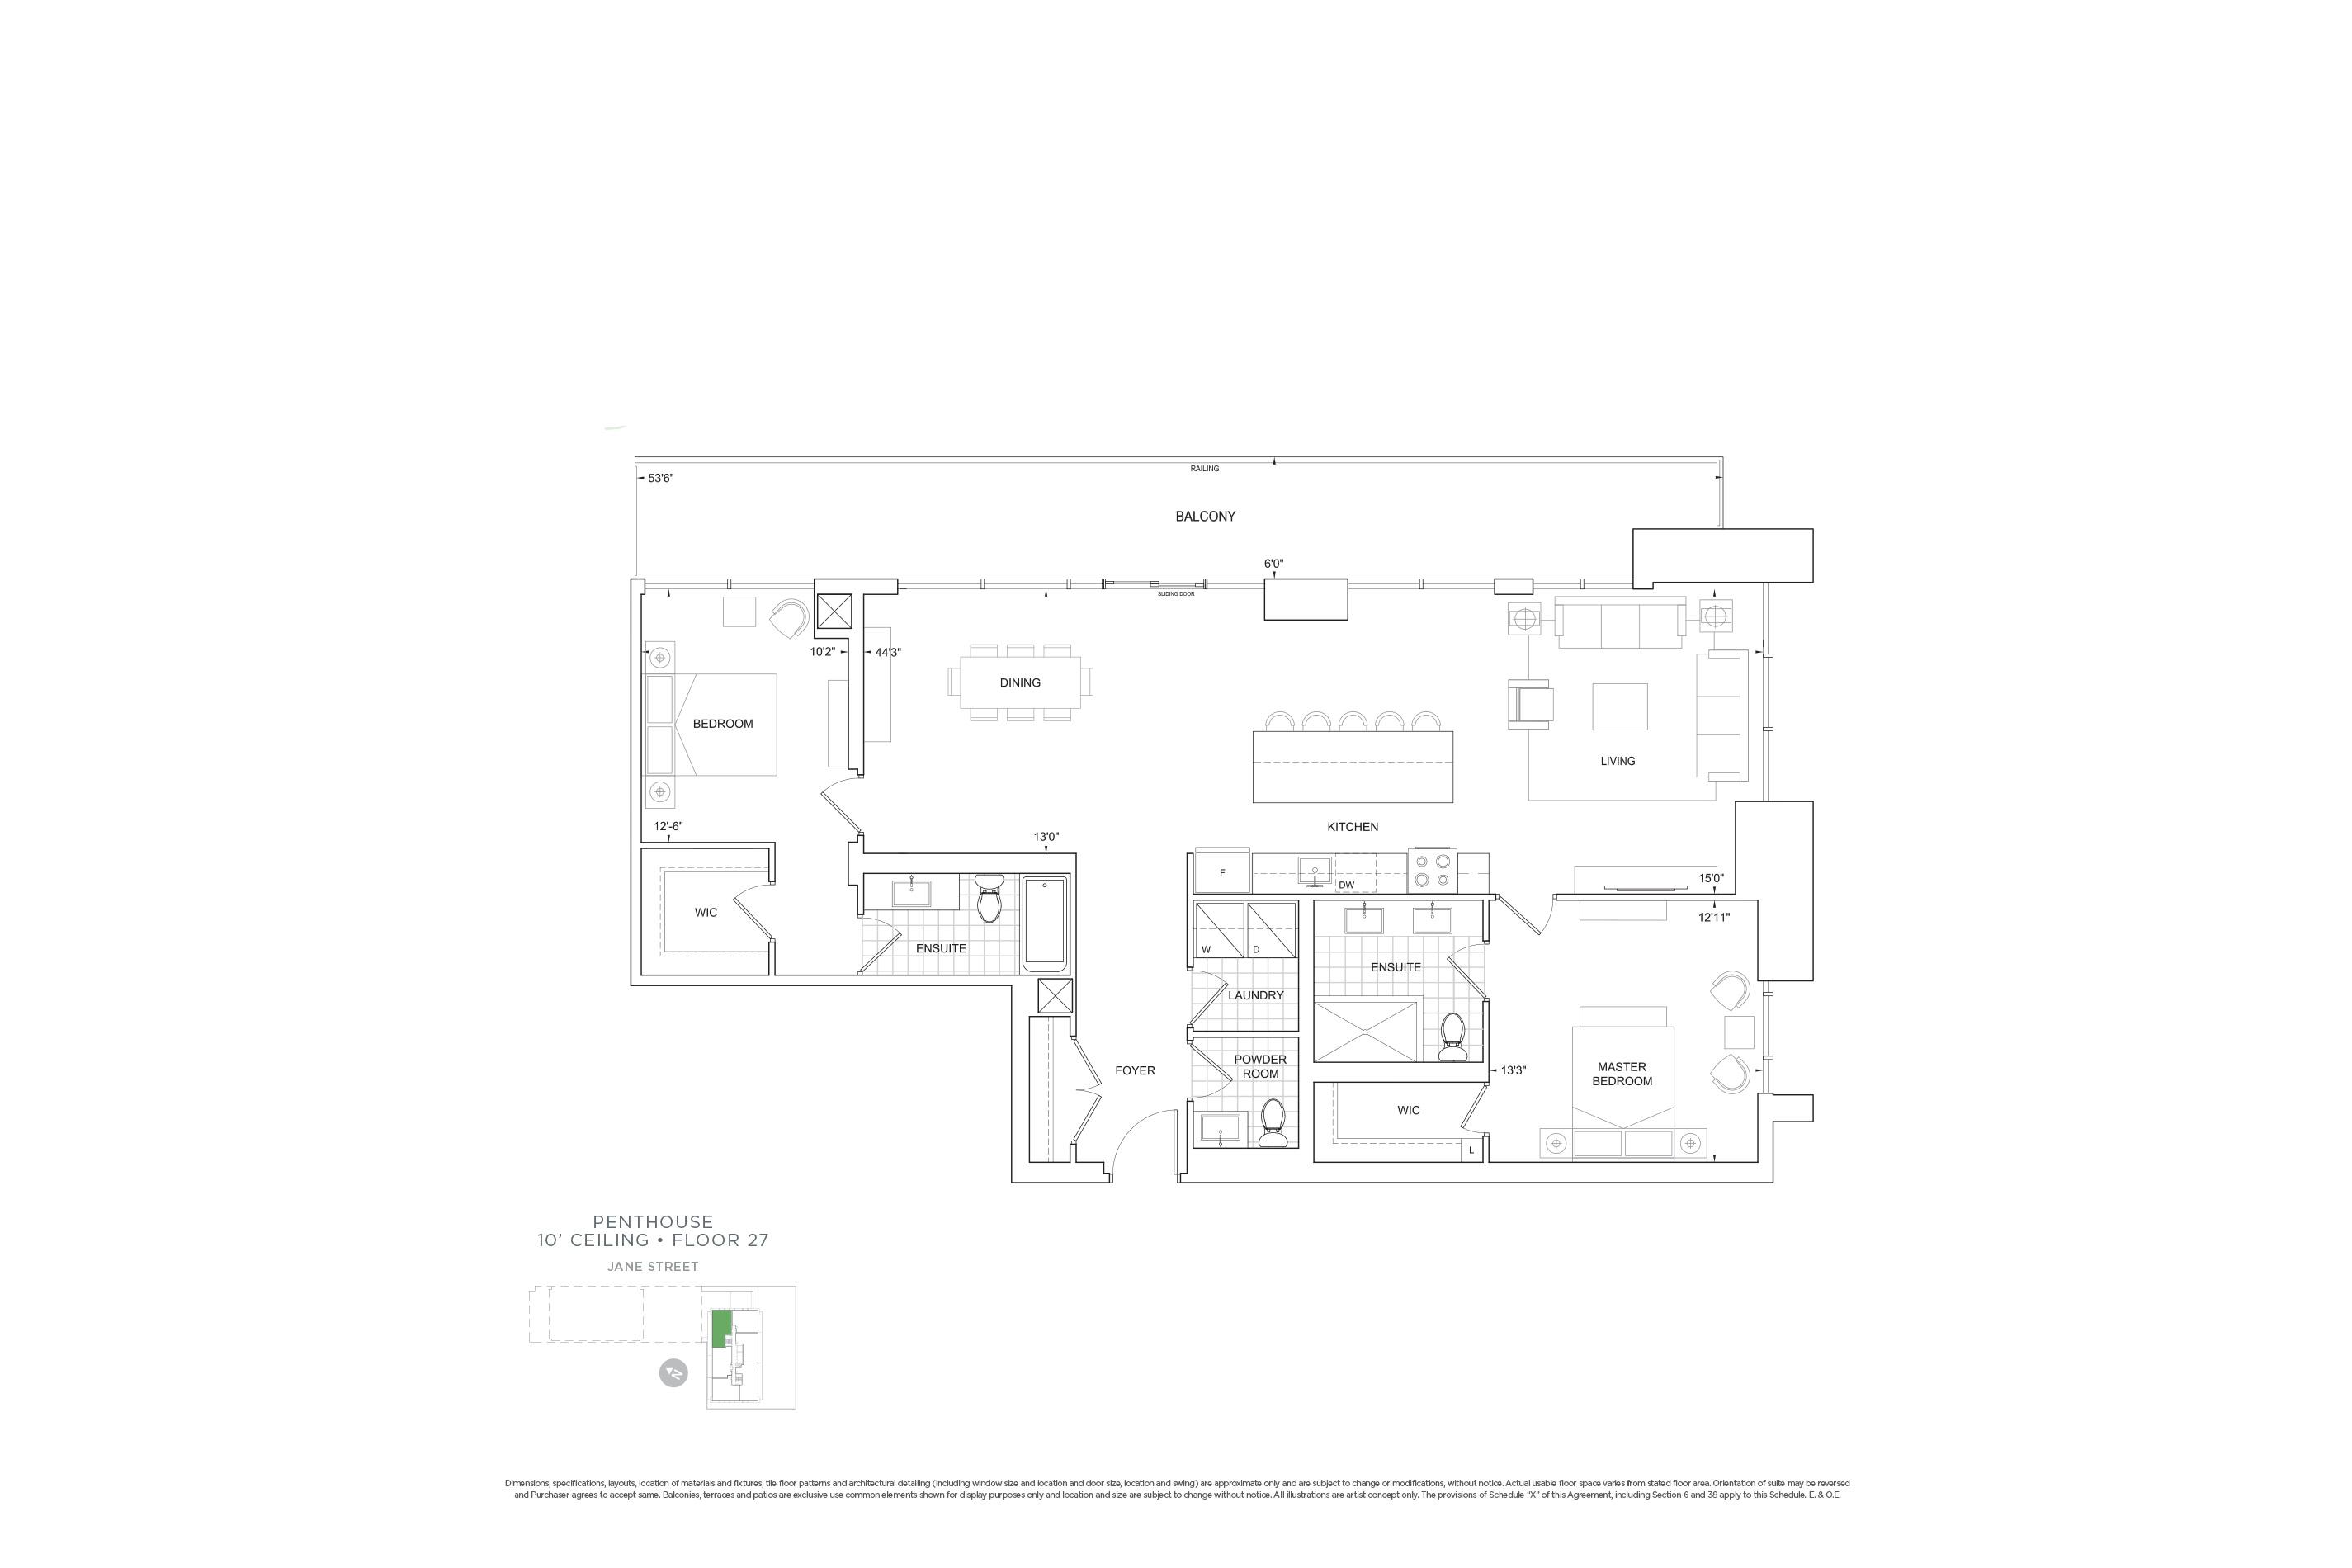 C1504 Penthouse Units